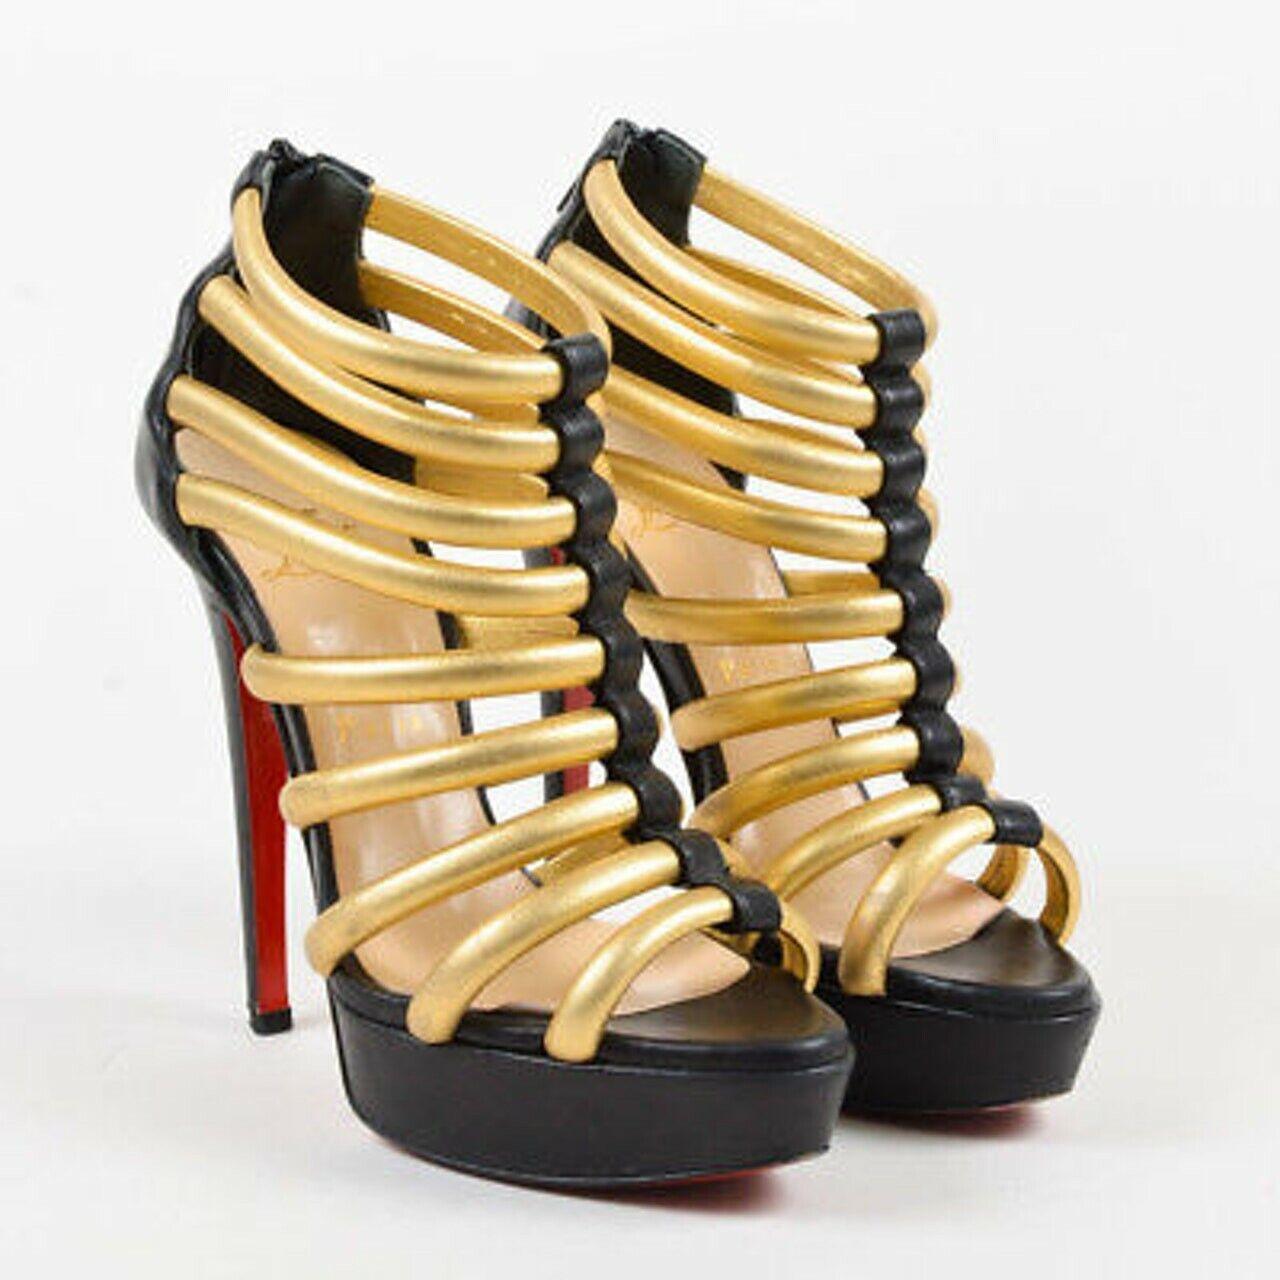 Stunning rare Christian Louboutin Ulona Gold caged heels heels heels 38 UK 5 top condition 3836eb